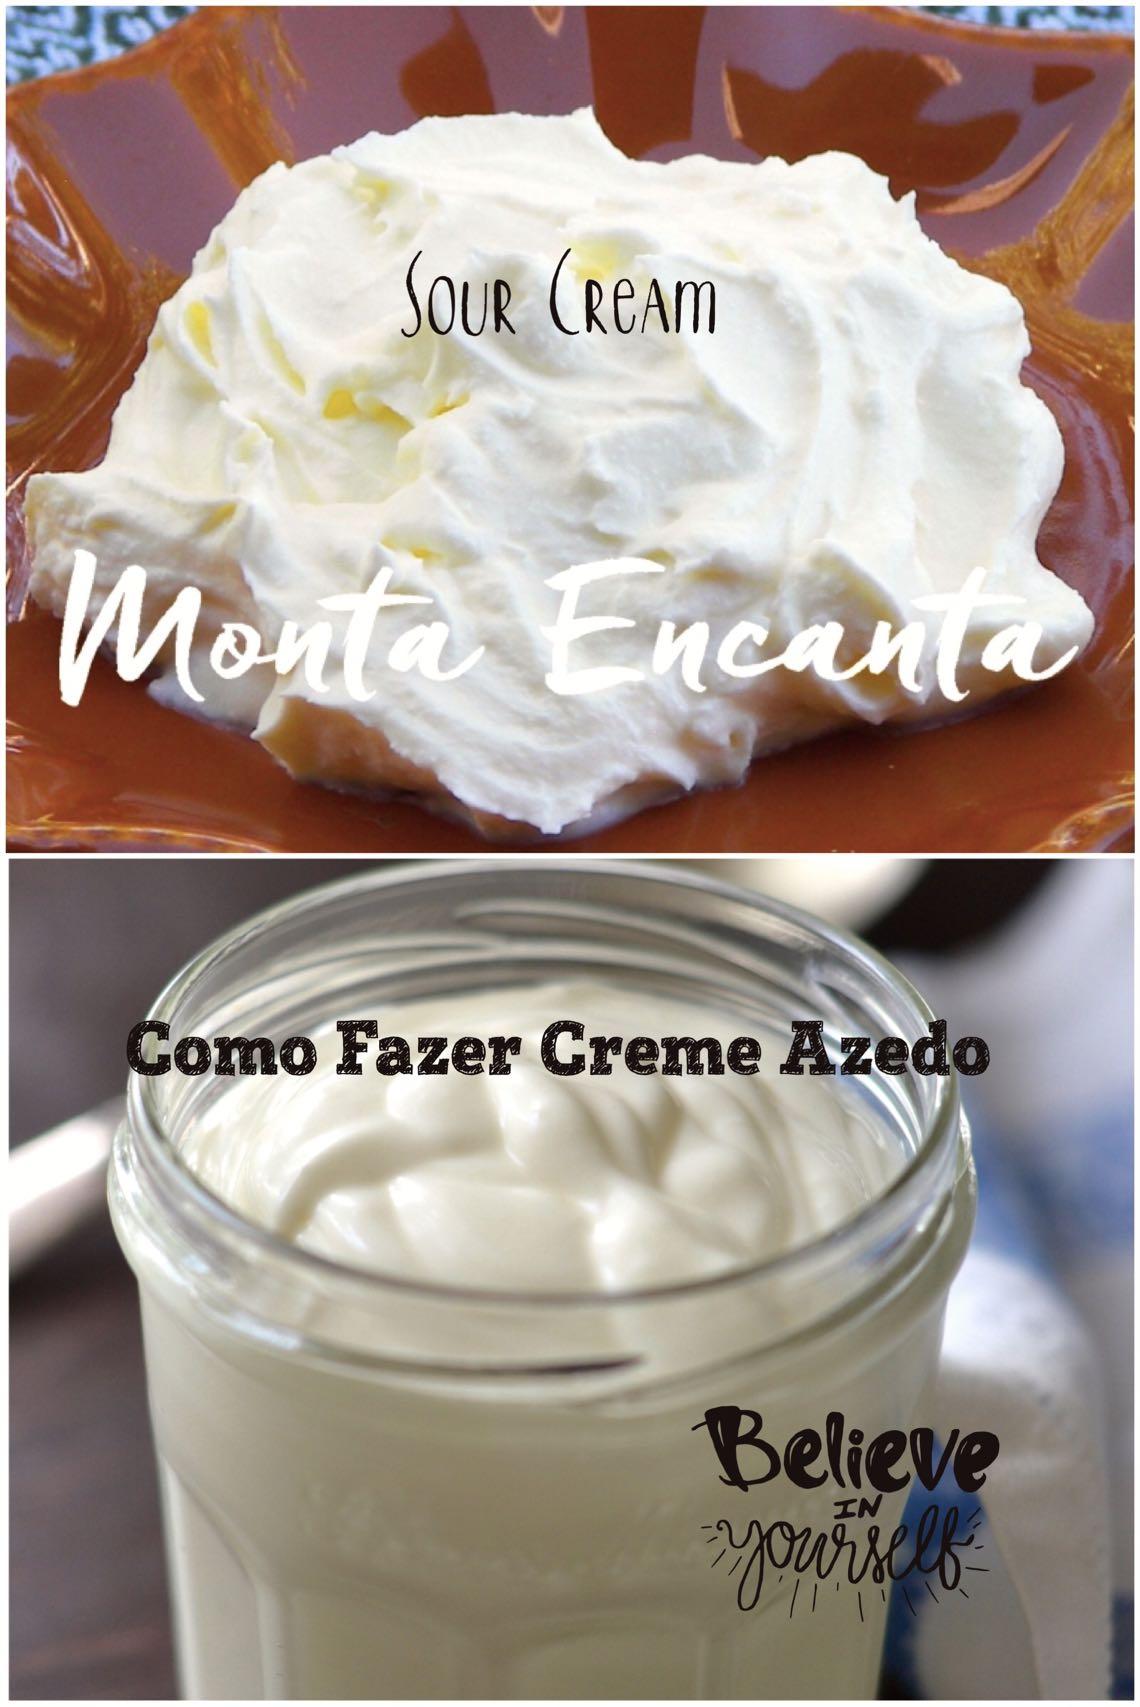 Sour Cream - Creme Azedo